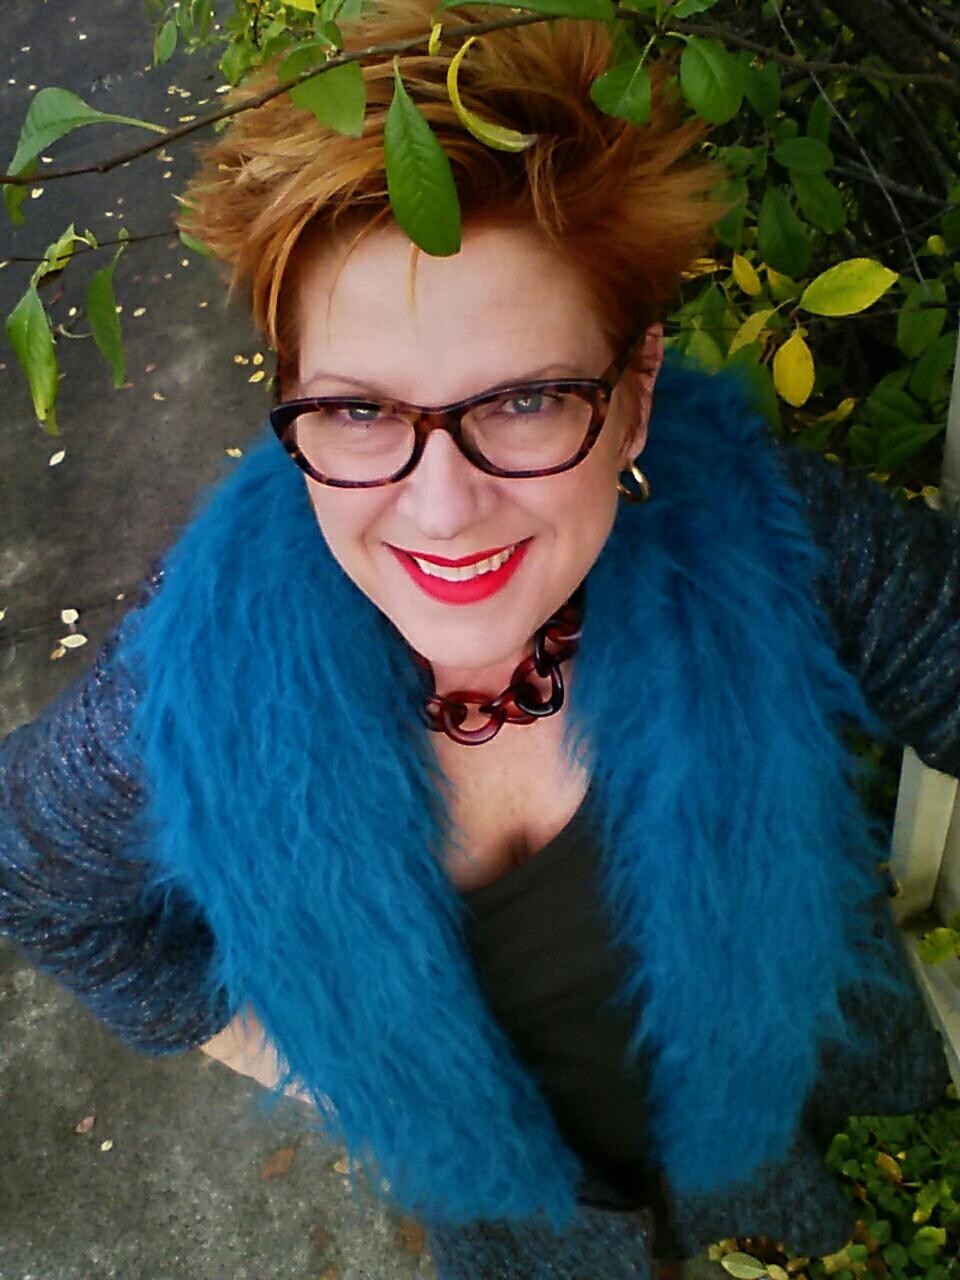 Faux fur at it's bluest